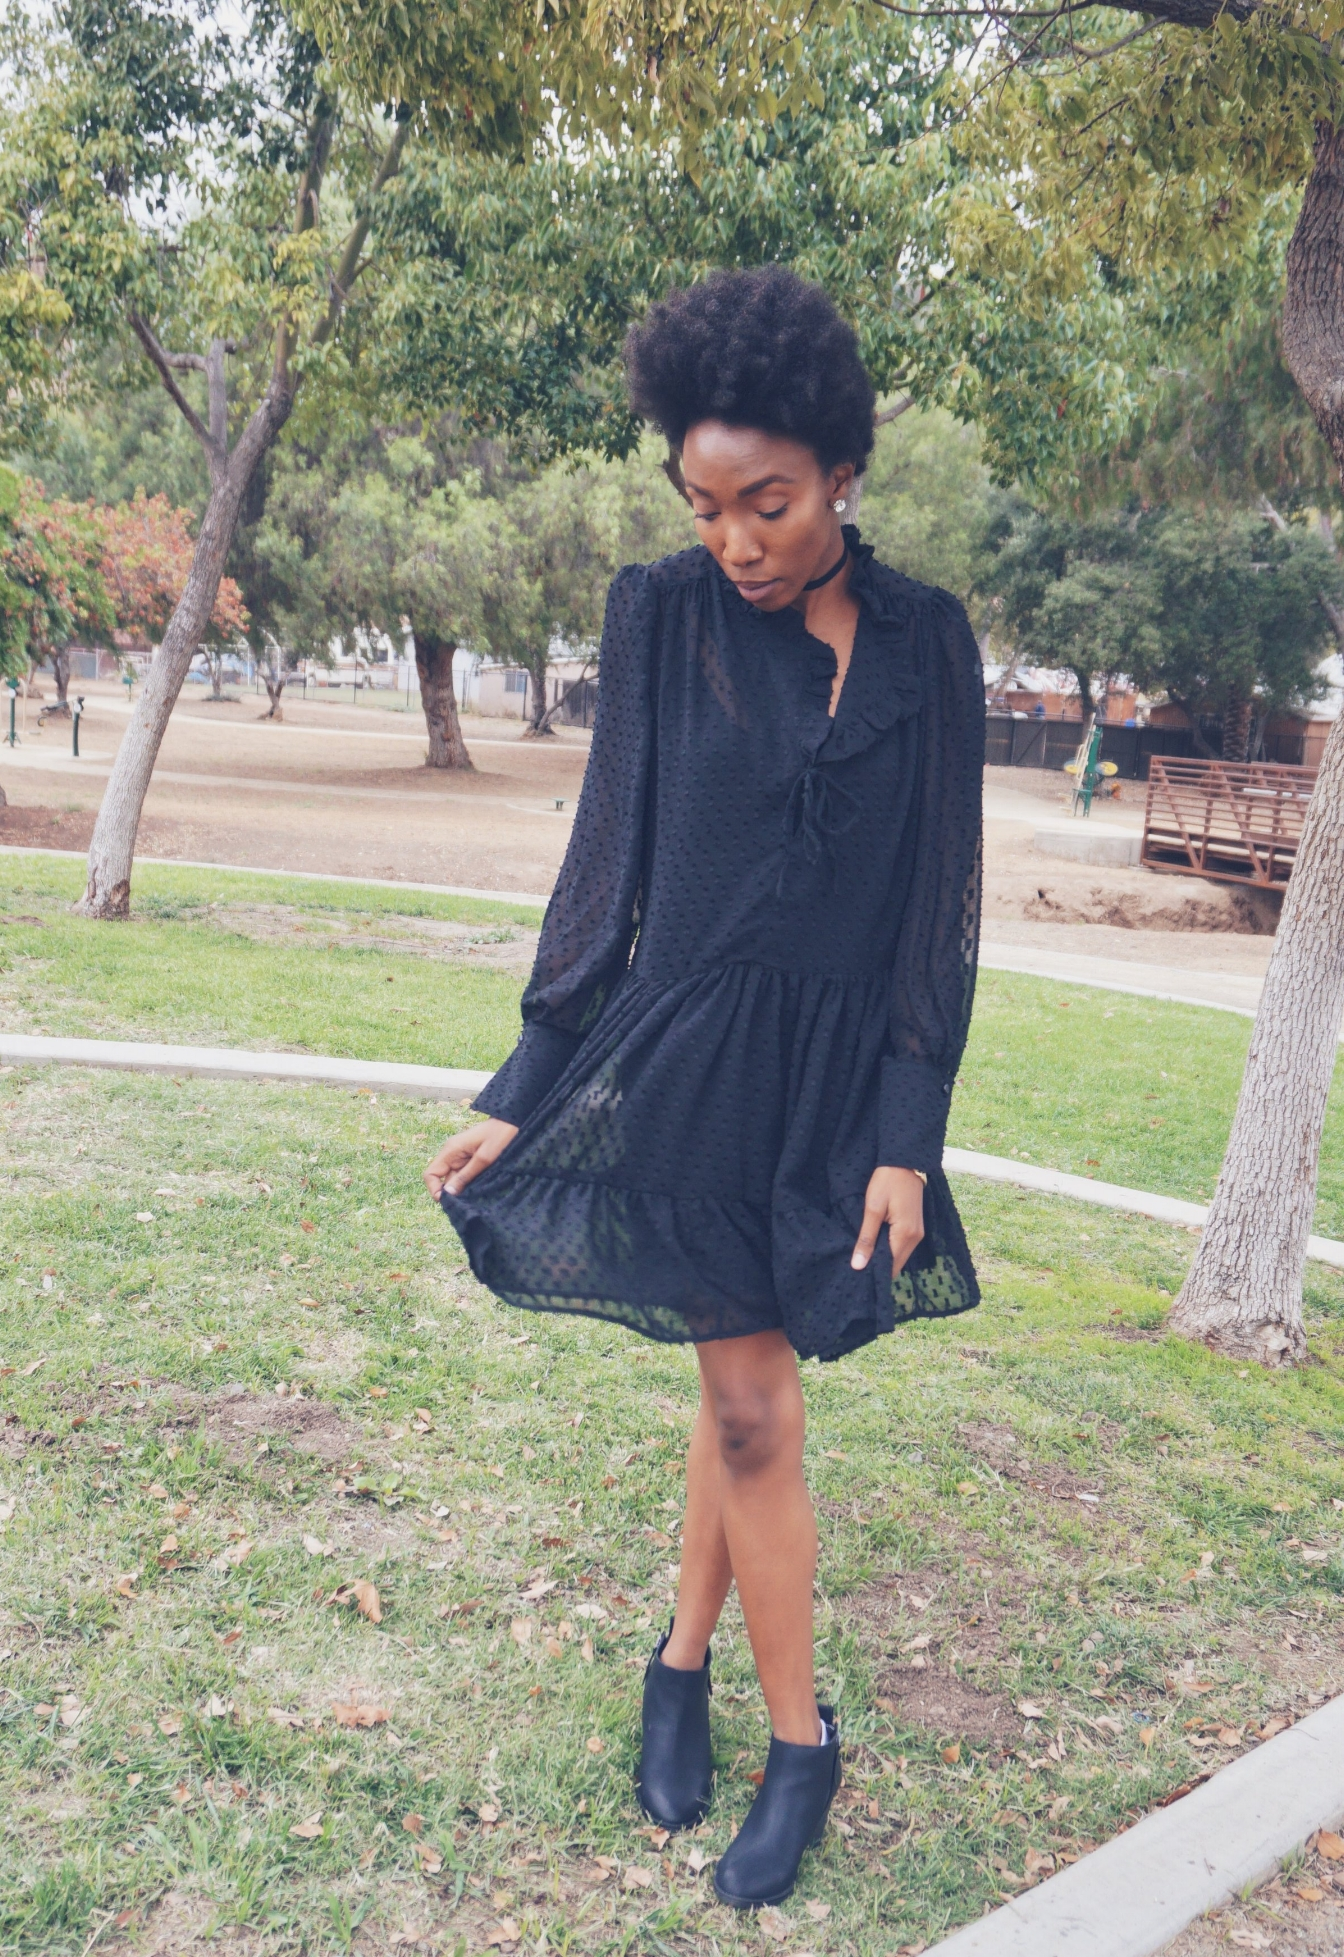 The Dress alone